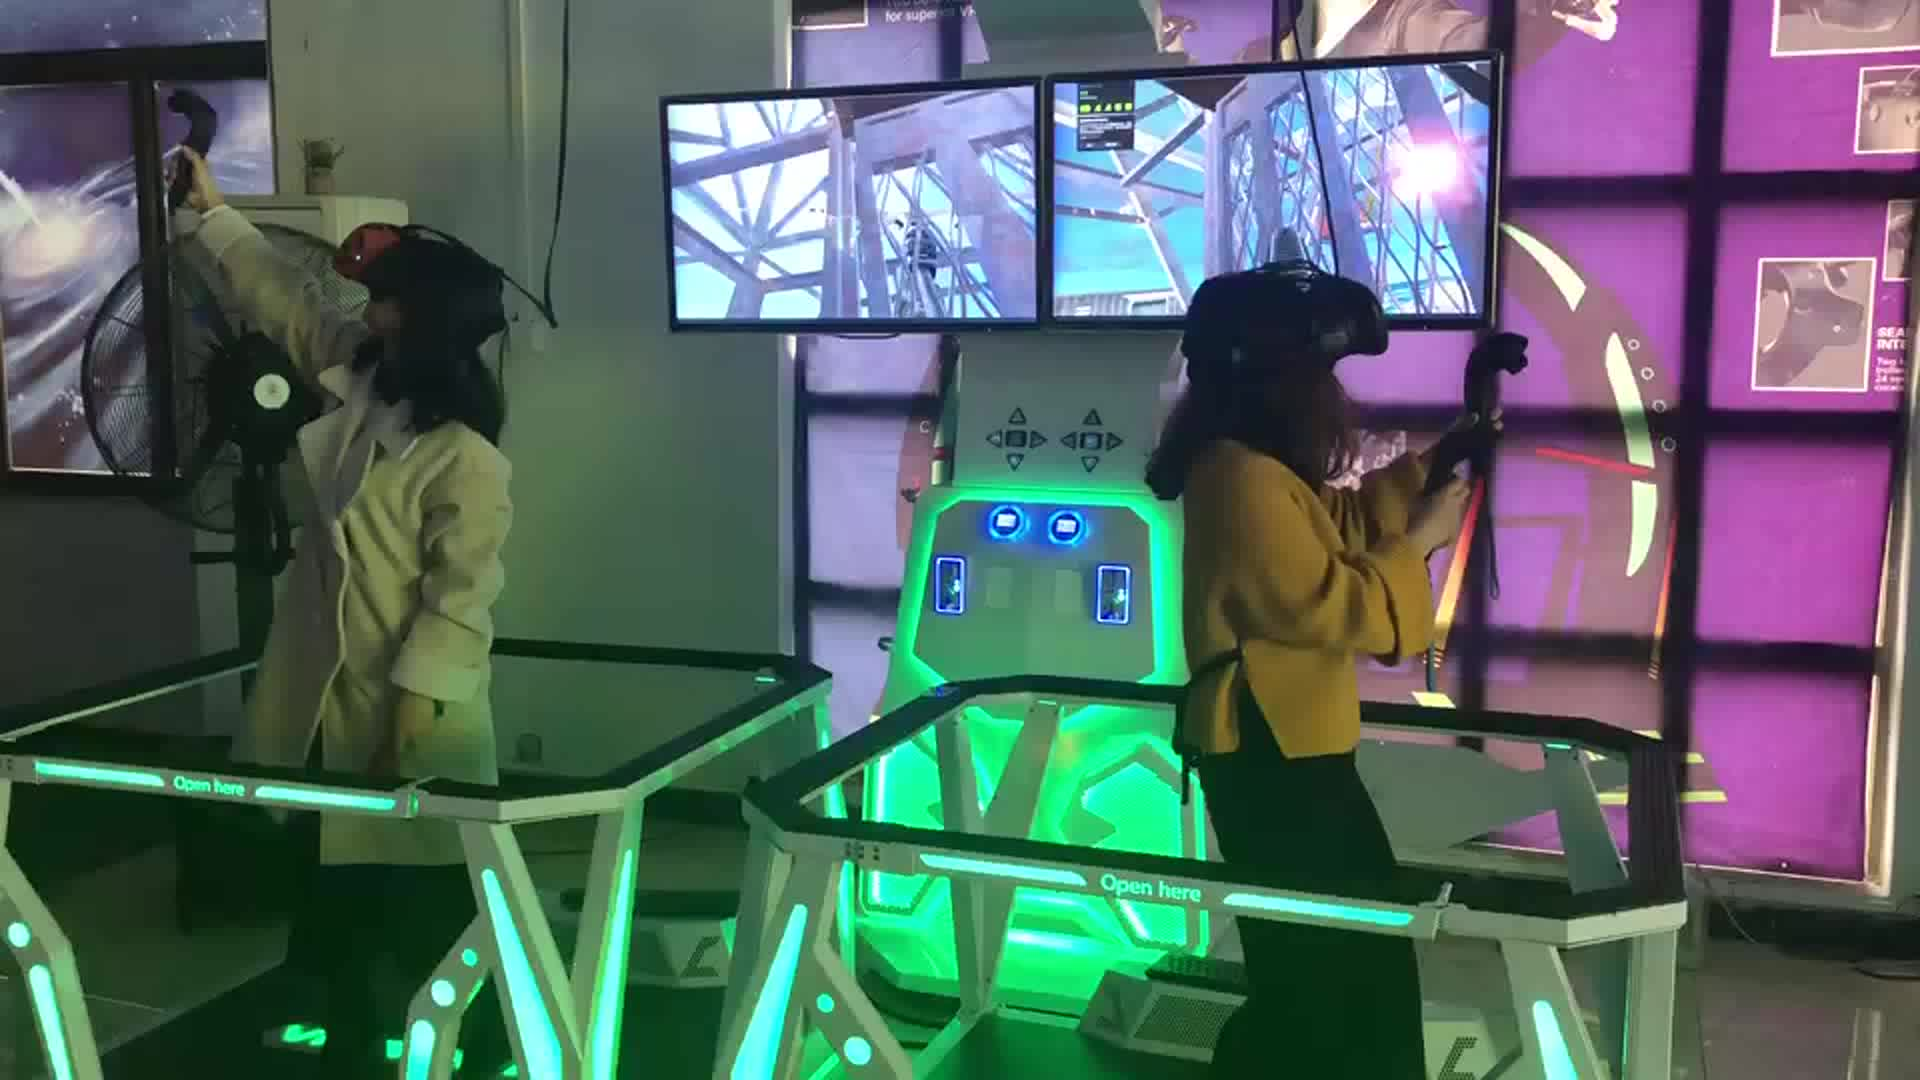 Arcade game vr entertainment electronic shooting simulator